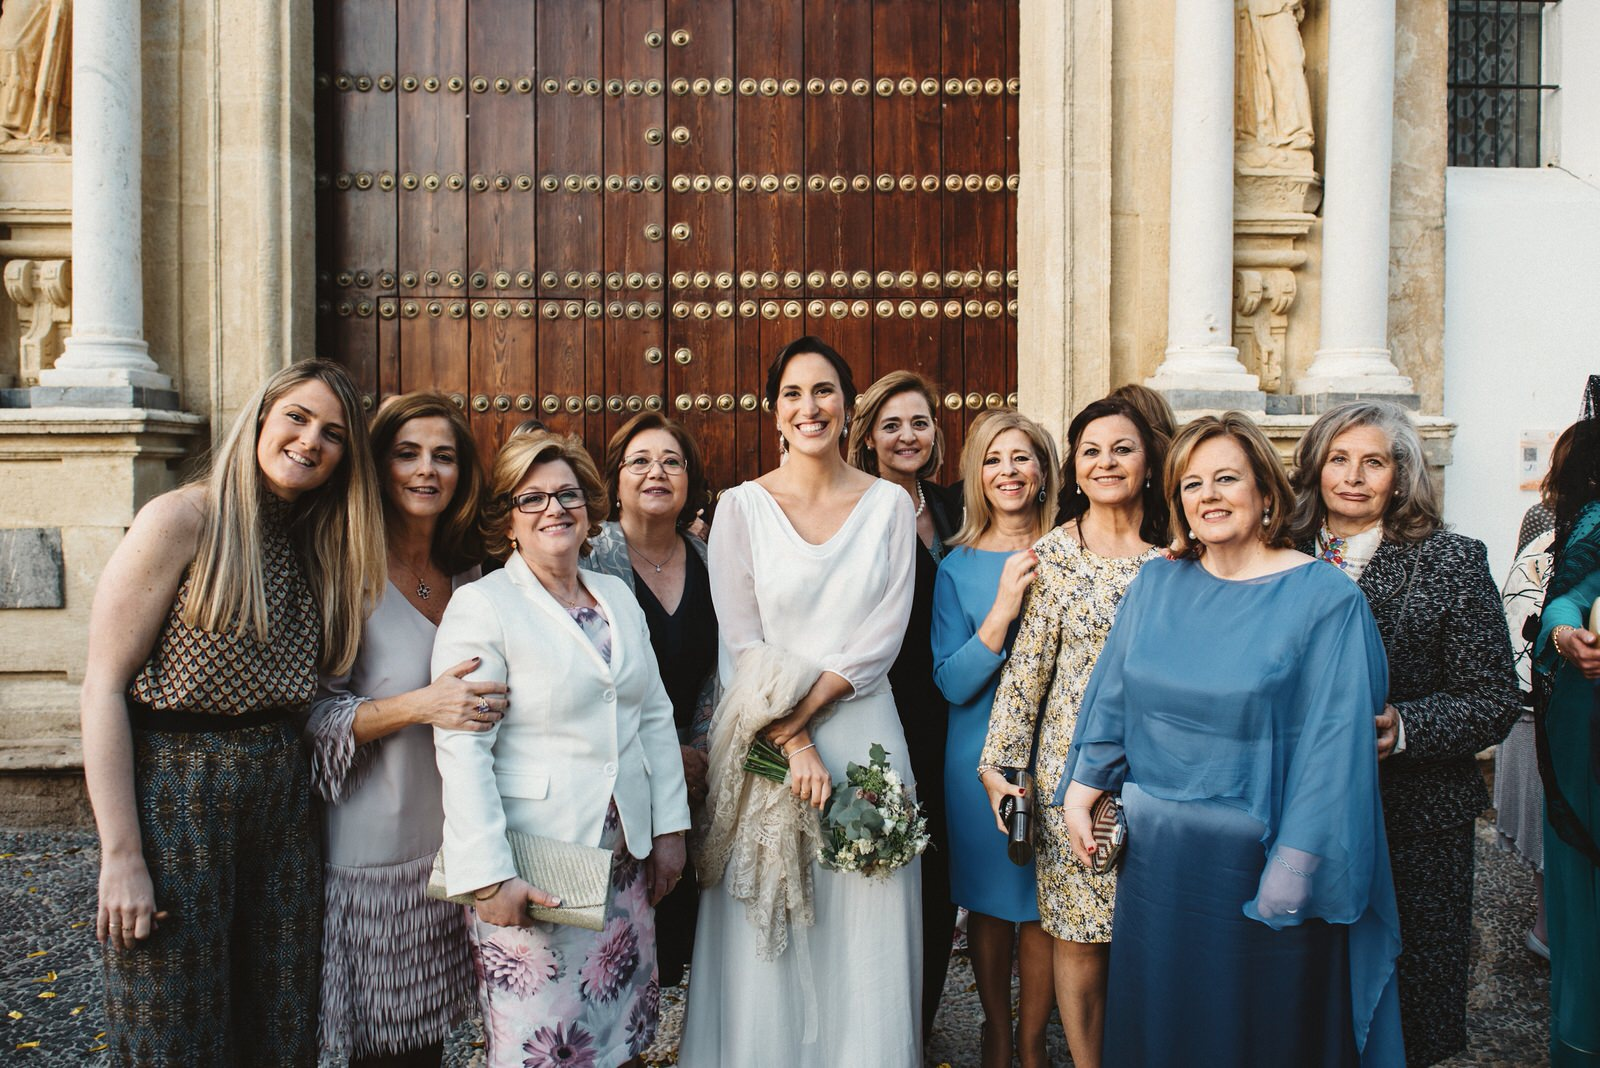 fotografo de bodas sevilla - fotografo boda - fotografía sevilla - Andrés AmarilloAAA_3262- fine.JPG